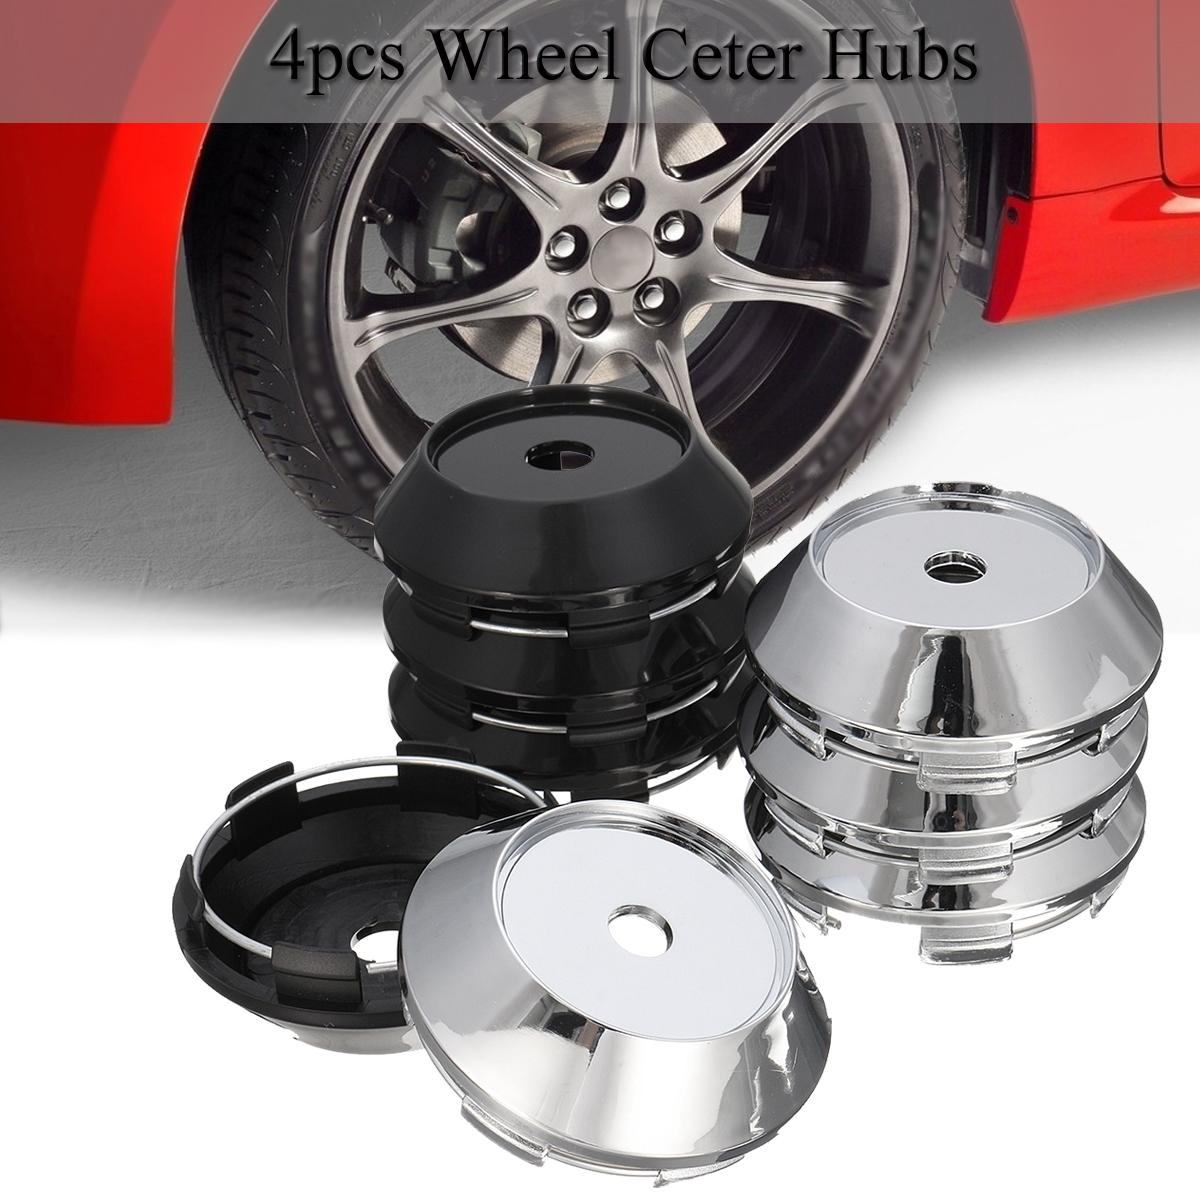 4pcs Universal 68mm ABS Chrome Car Wheel Center Plain Hub Caps Covers Holder